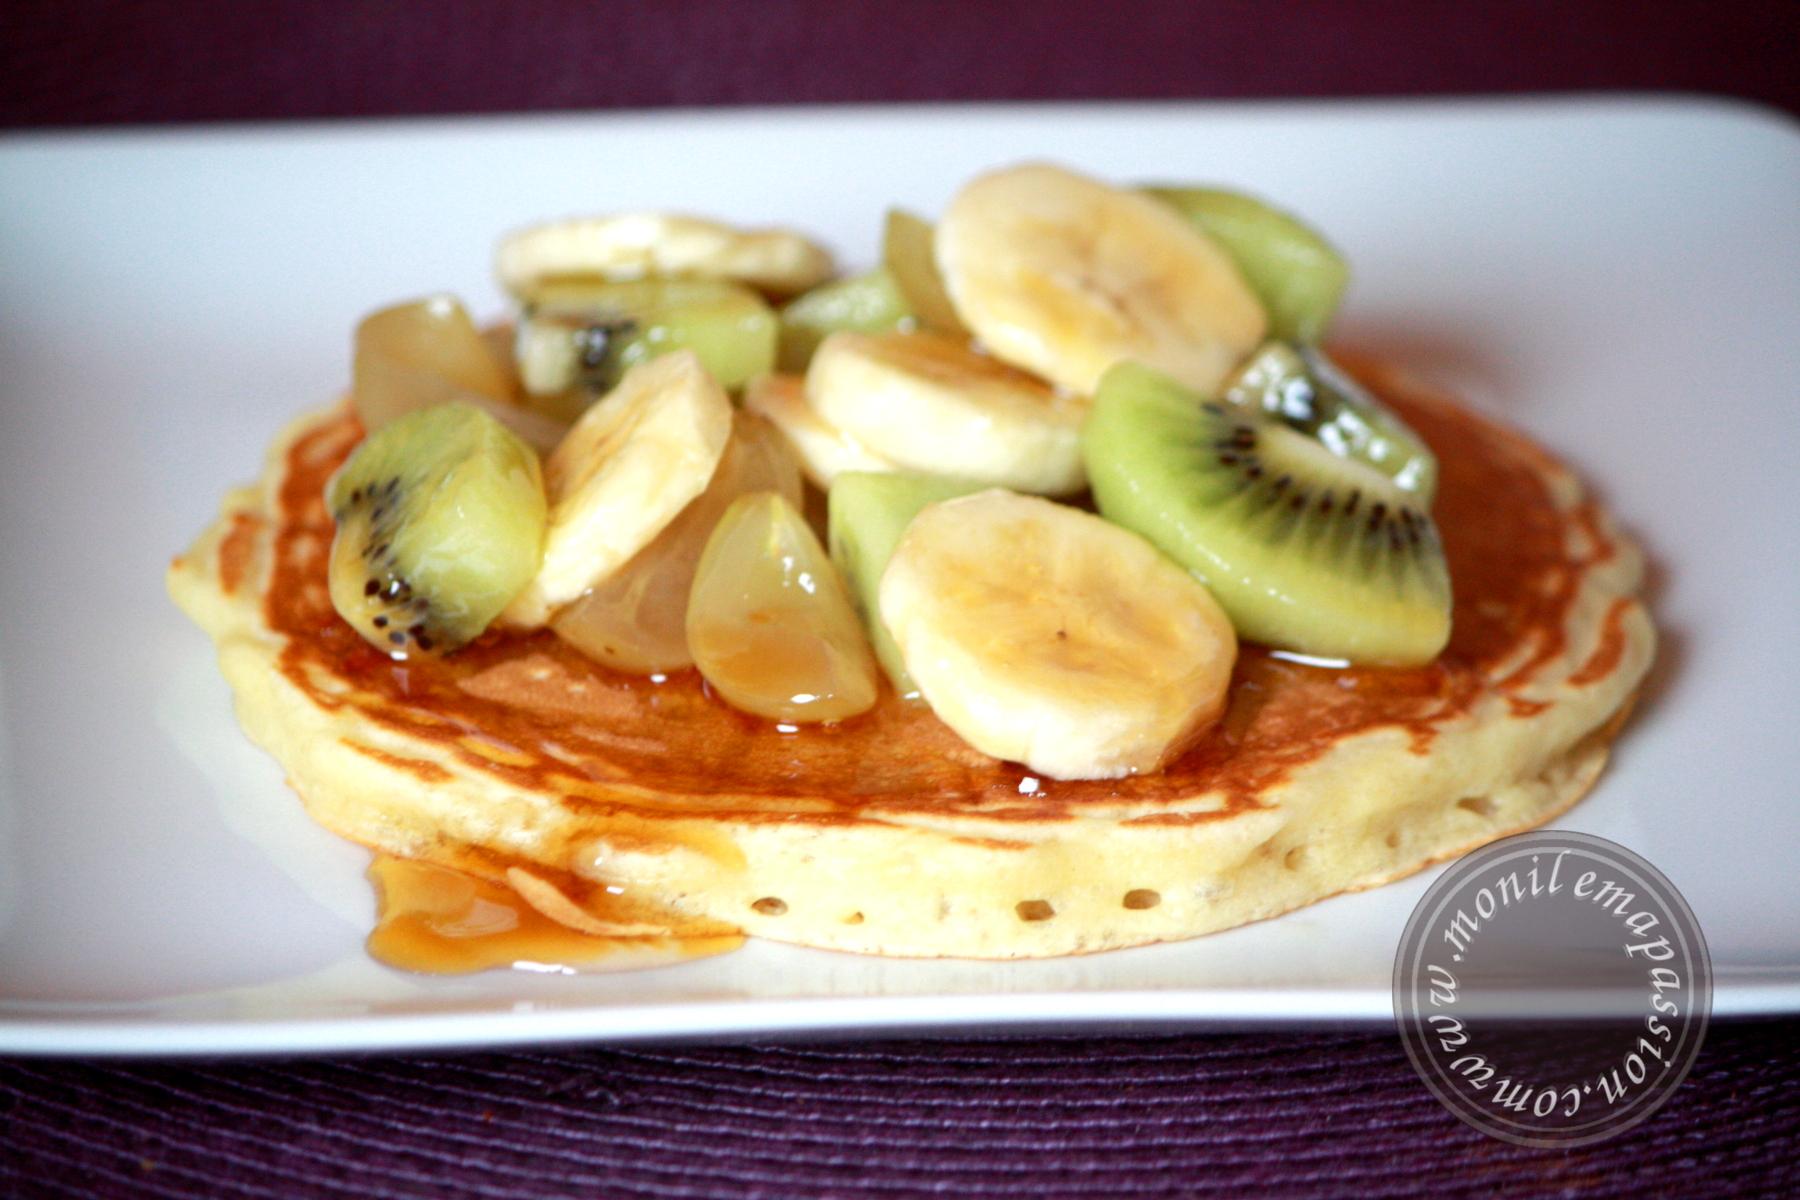 Pancakes – Buttermilk pancakes